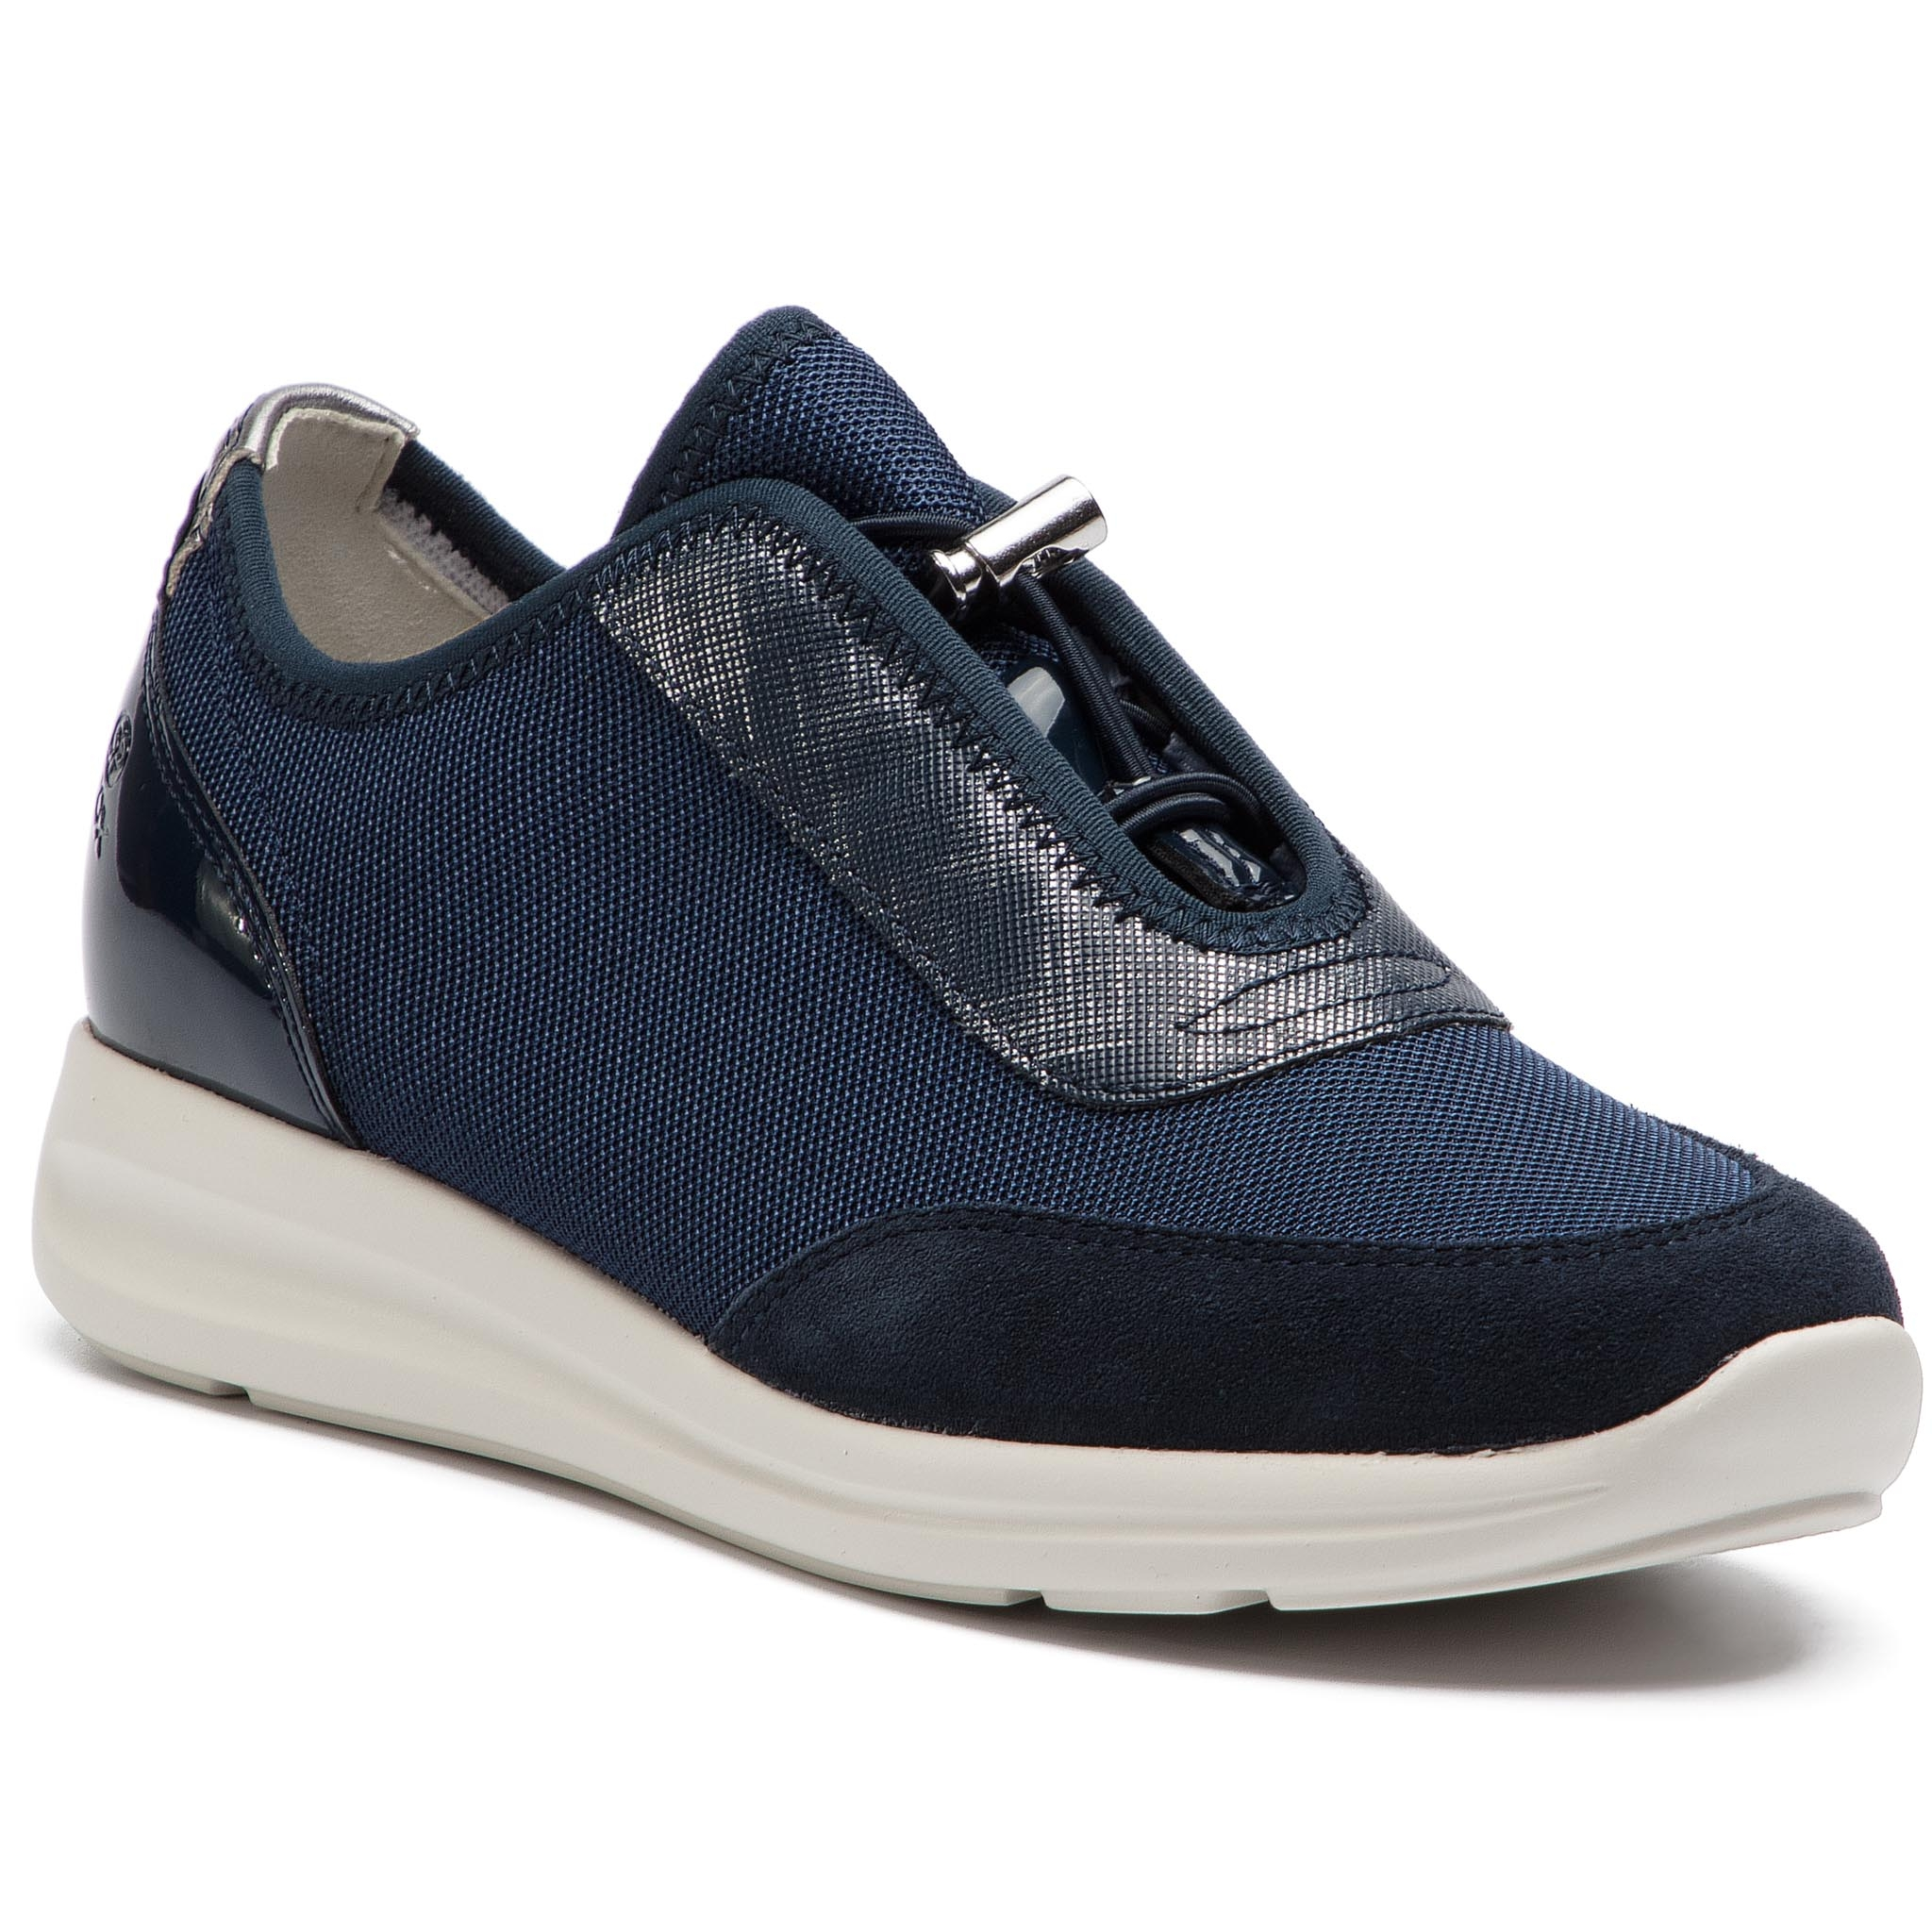 Sportcipő GEOX - D Agyleah C D926CC 01422 C4002 Navy - Glami.hu 6af5e11d46